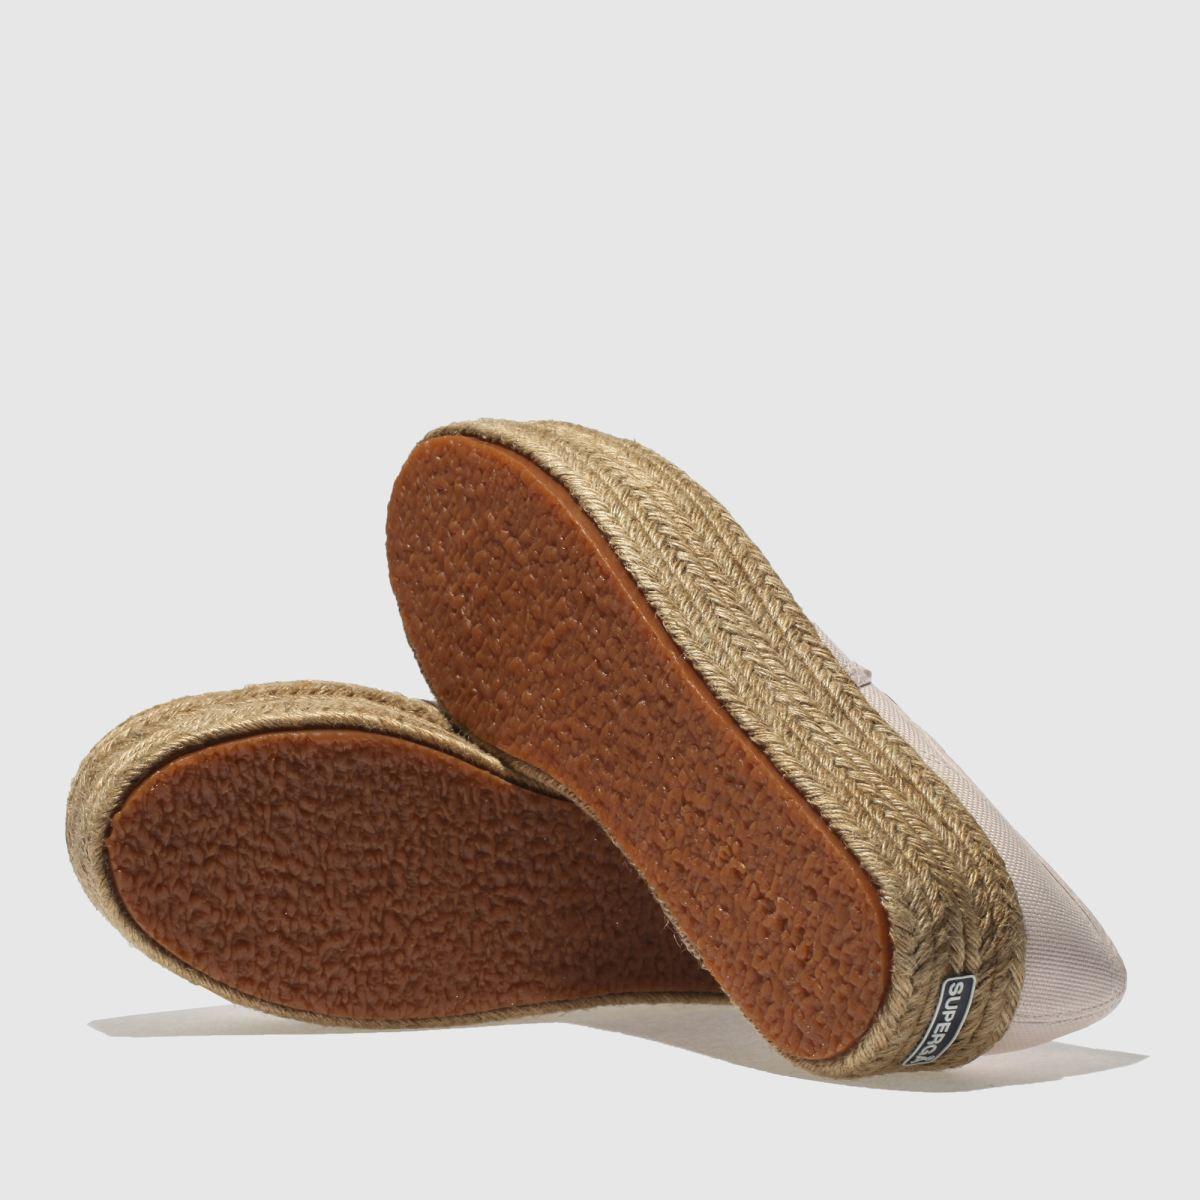 Damen Rosa superga 2790 Cotrope Sneaker | Schuhe schuh Gute Qualität beliebte Schuhe | 09c5c4